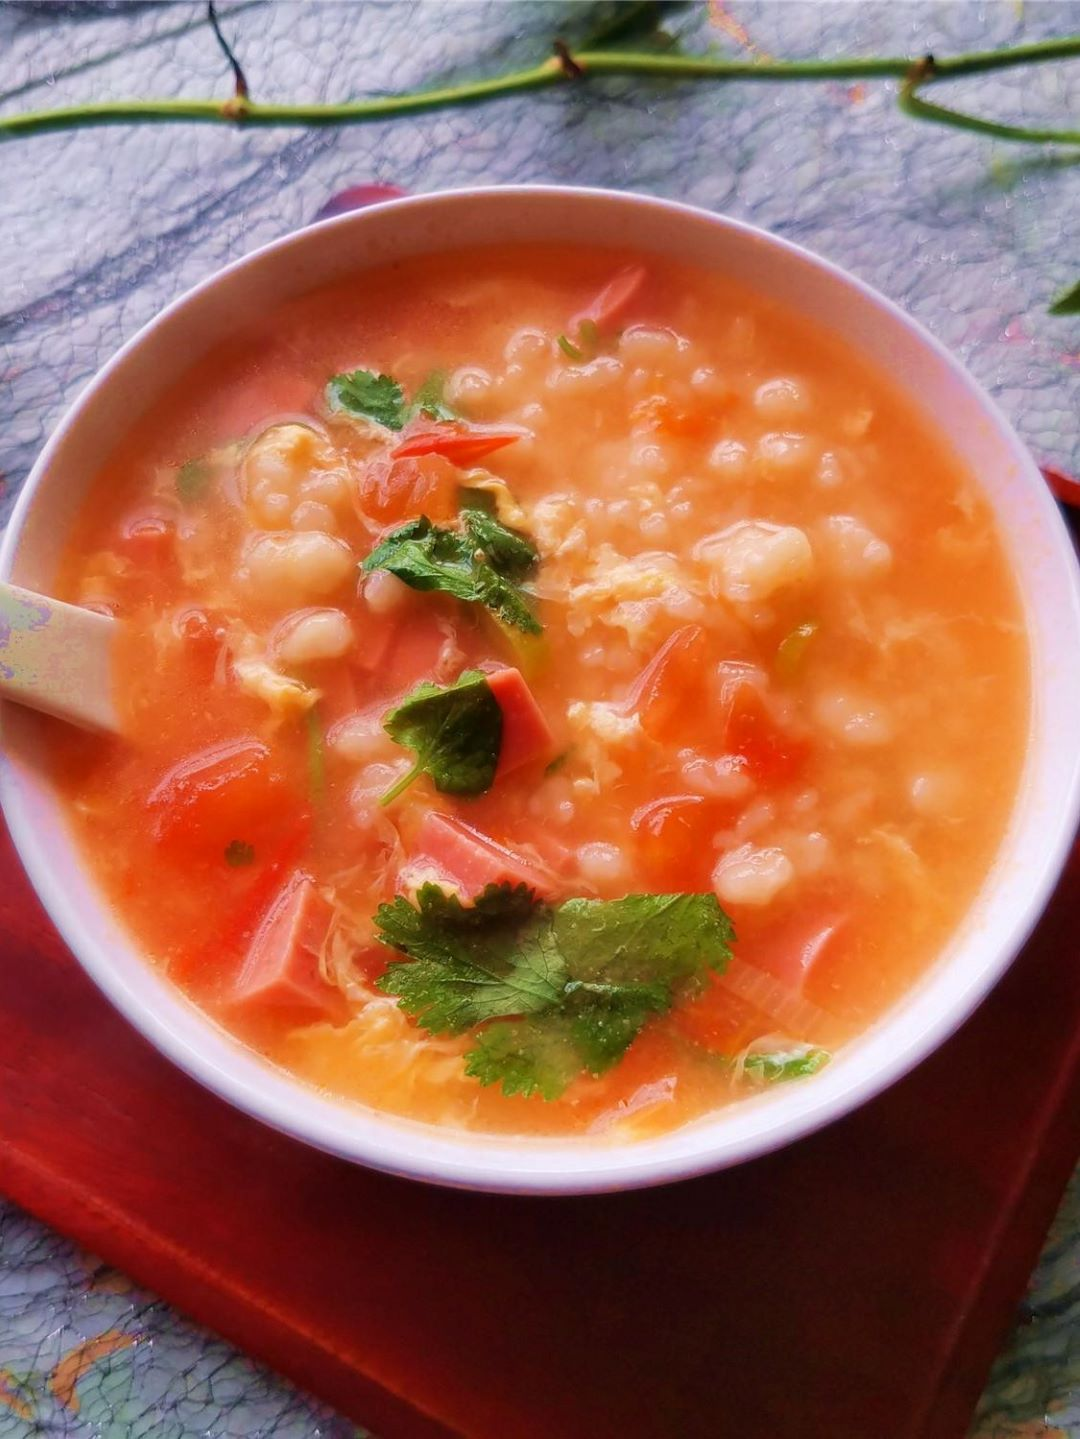 Tomato And Egg Flour Pimple Soup 2021